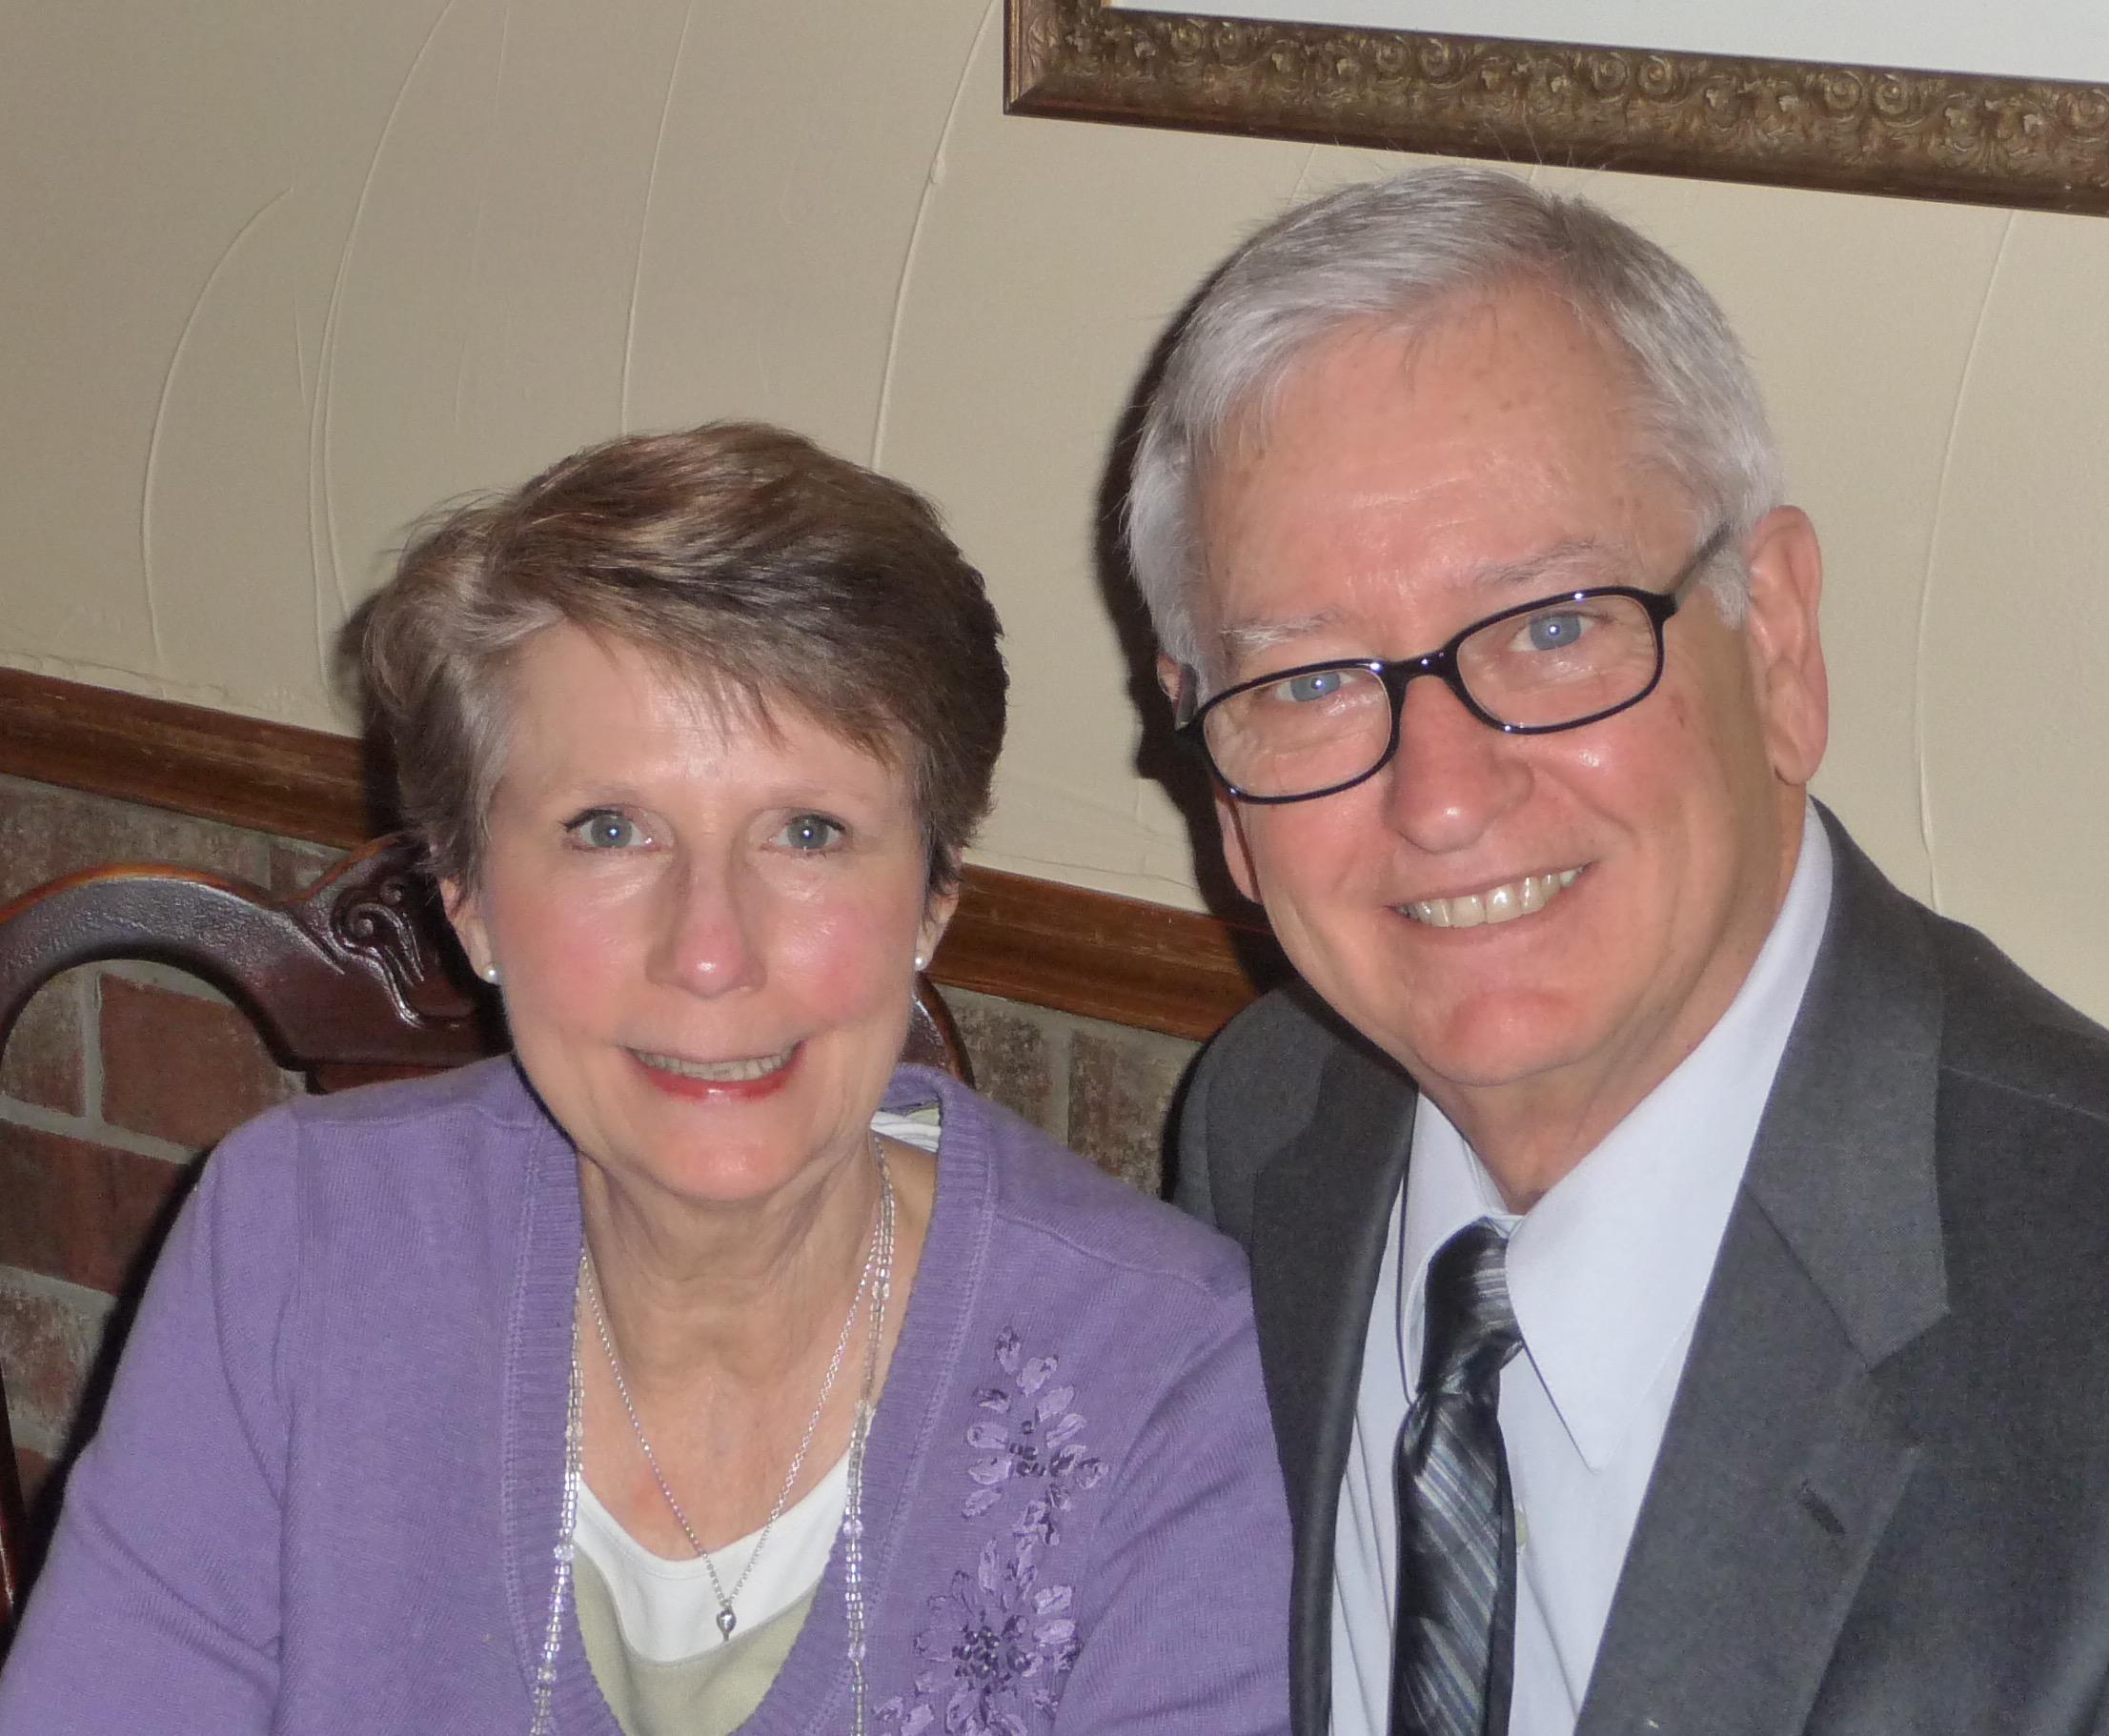 Dr. Robert and Mrs. Carel Shehane